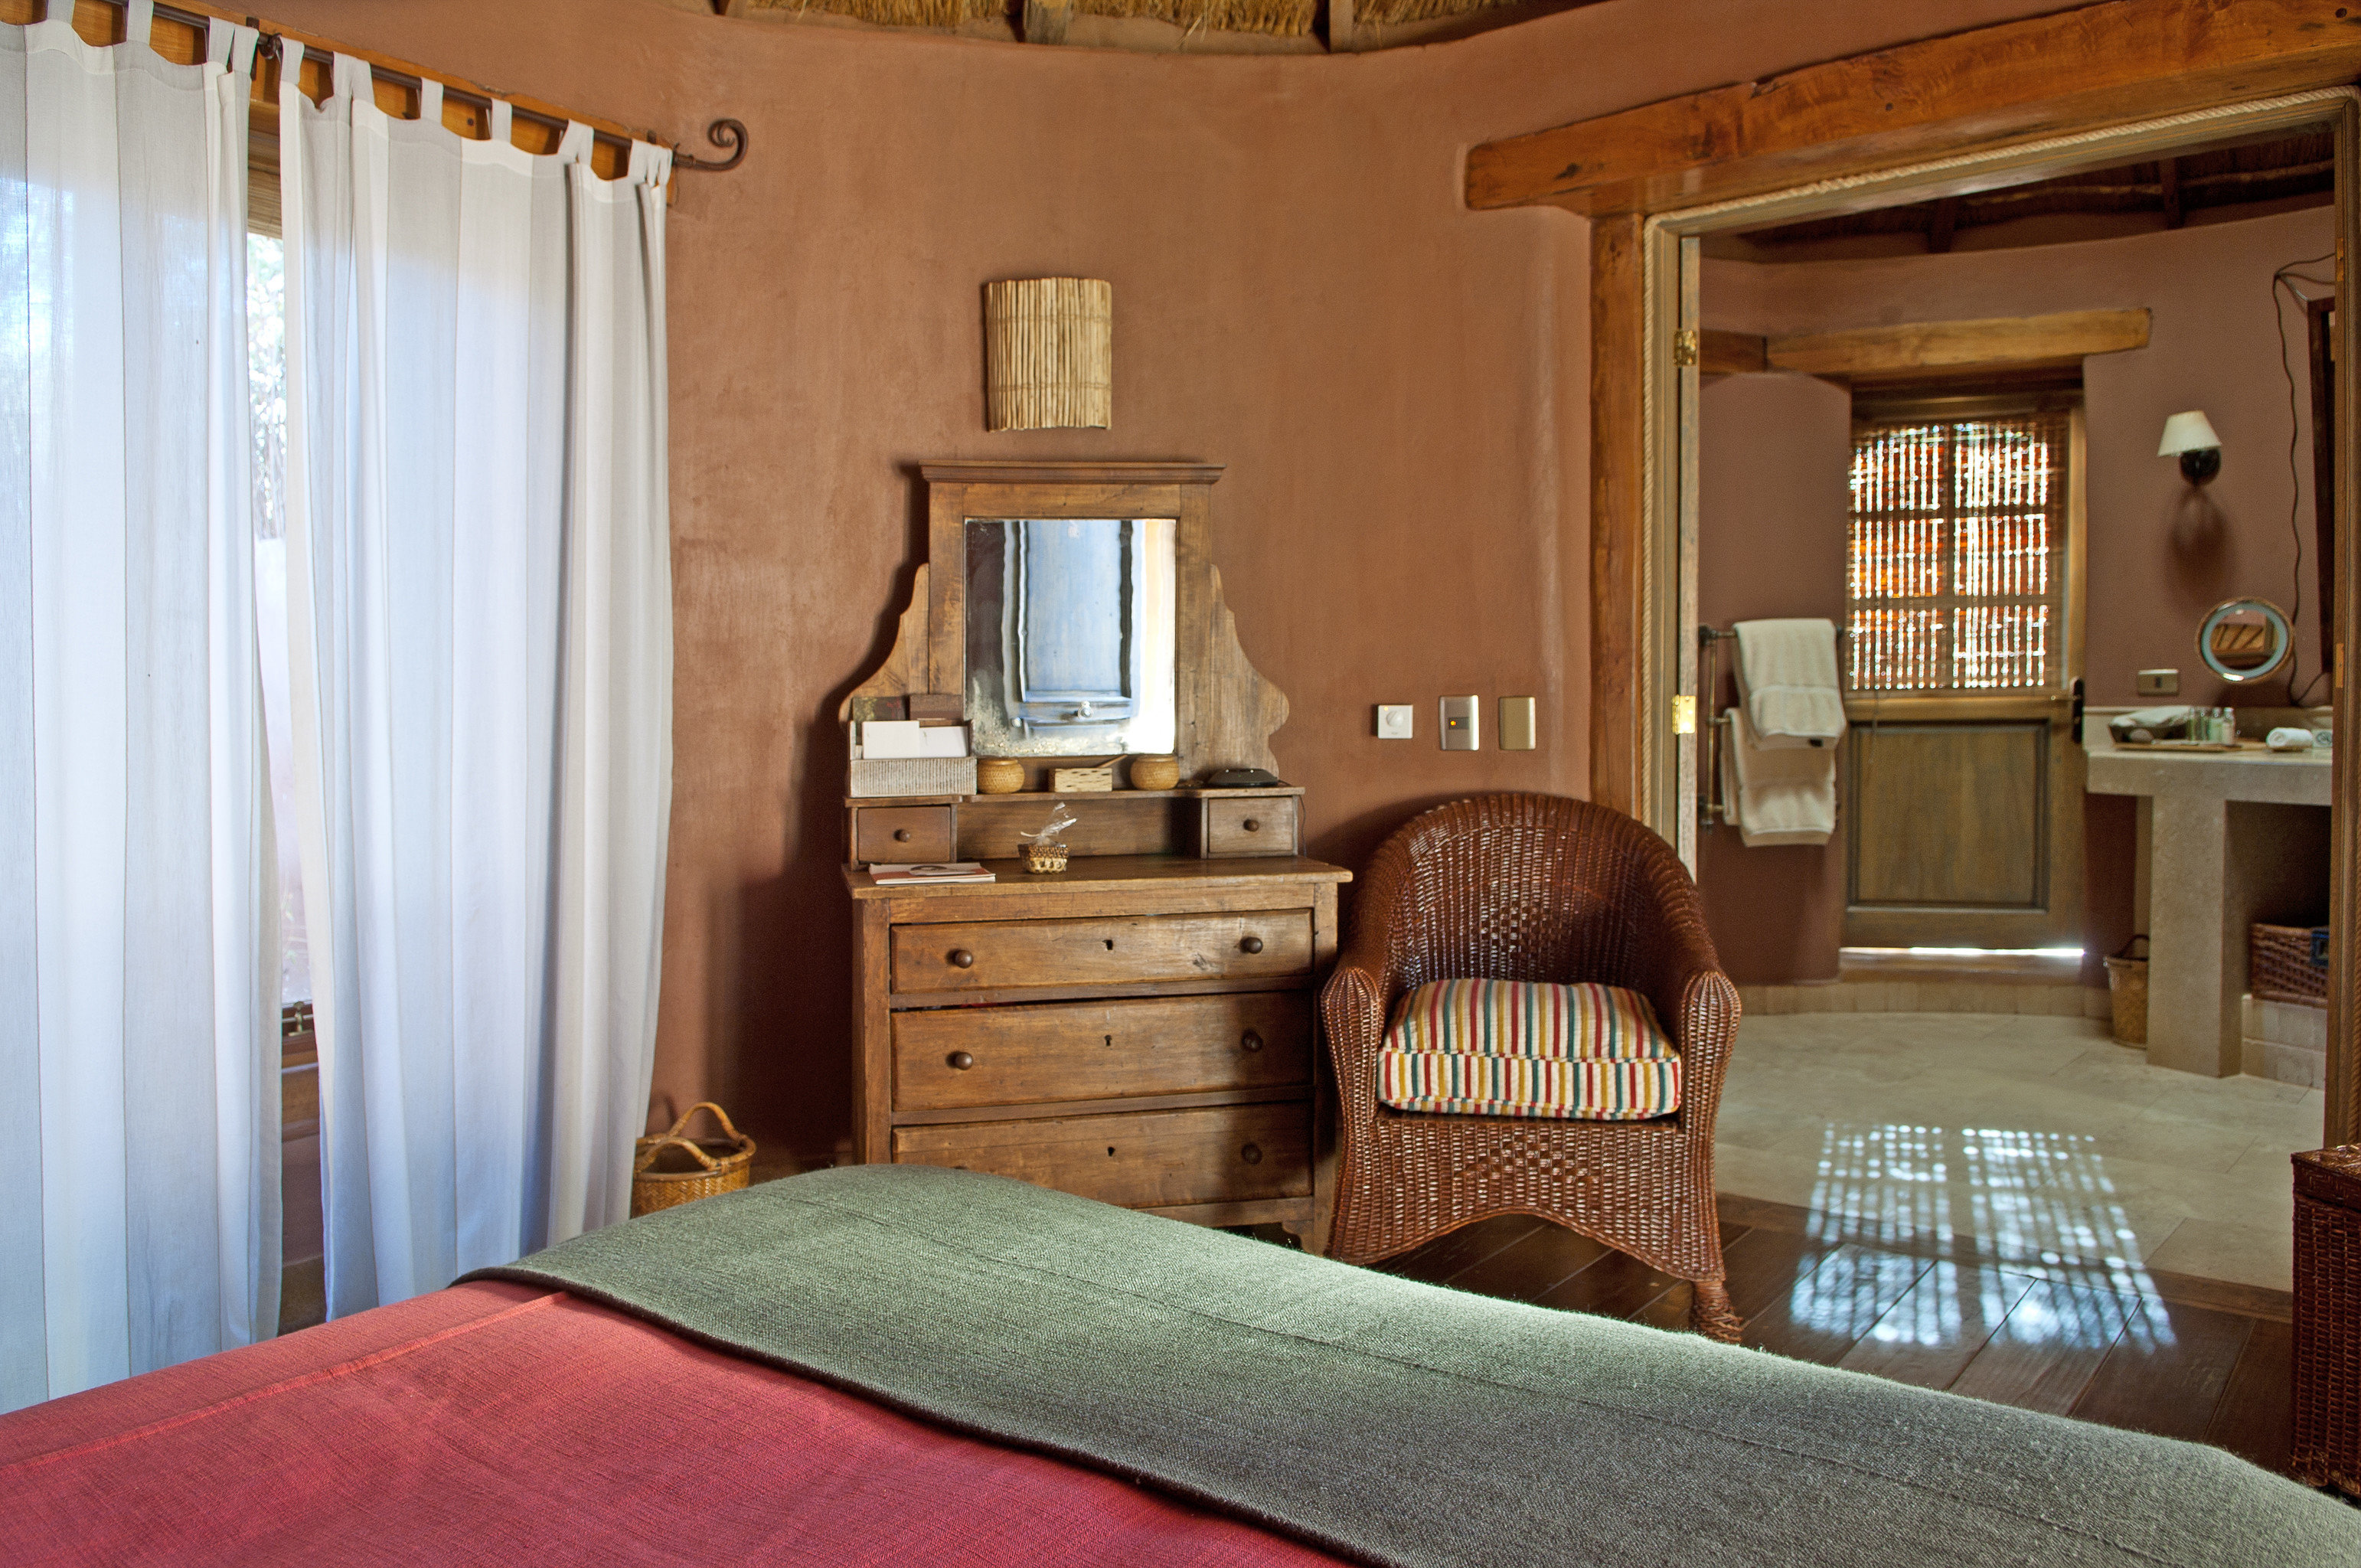 Bedroom Cultural Desert Romance Rustic property home cottage hardwood Suite farmhouse